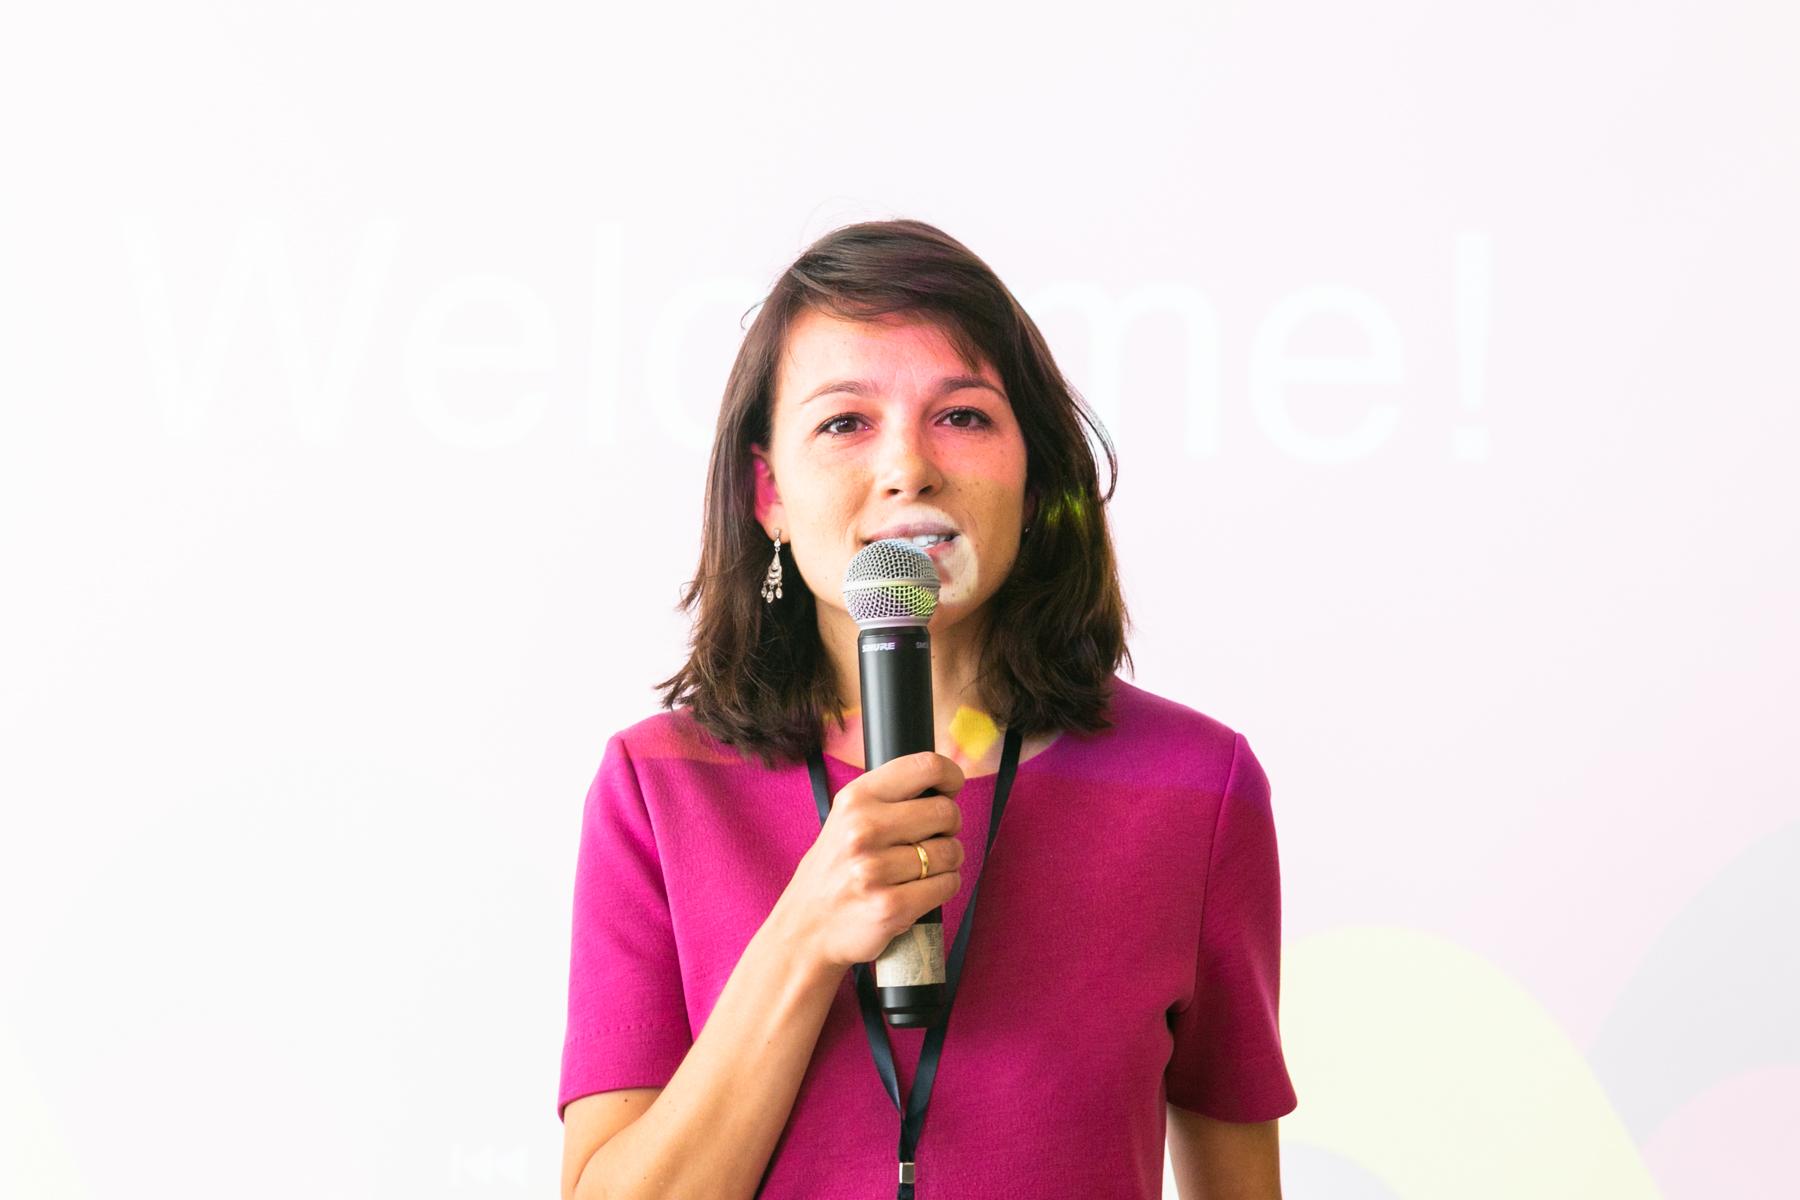 Karolina Decker her startup FinMaries offers financial services for women